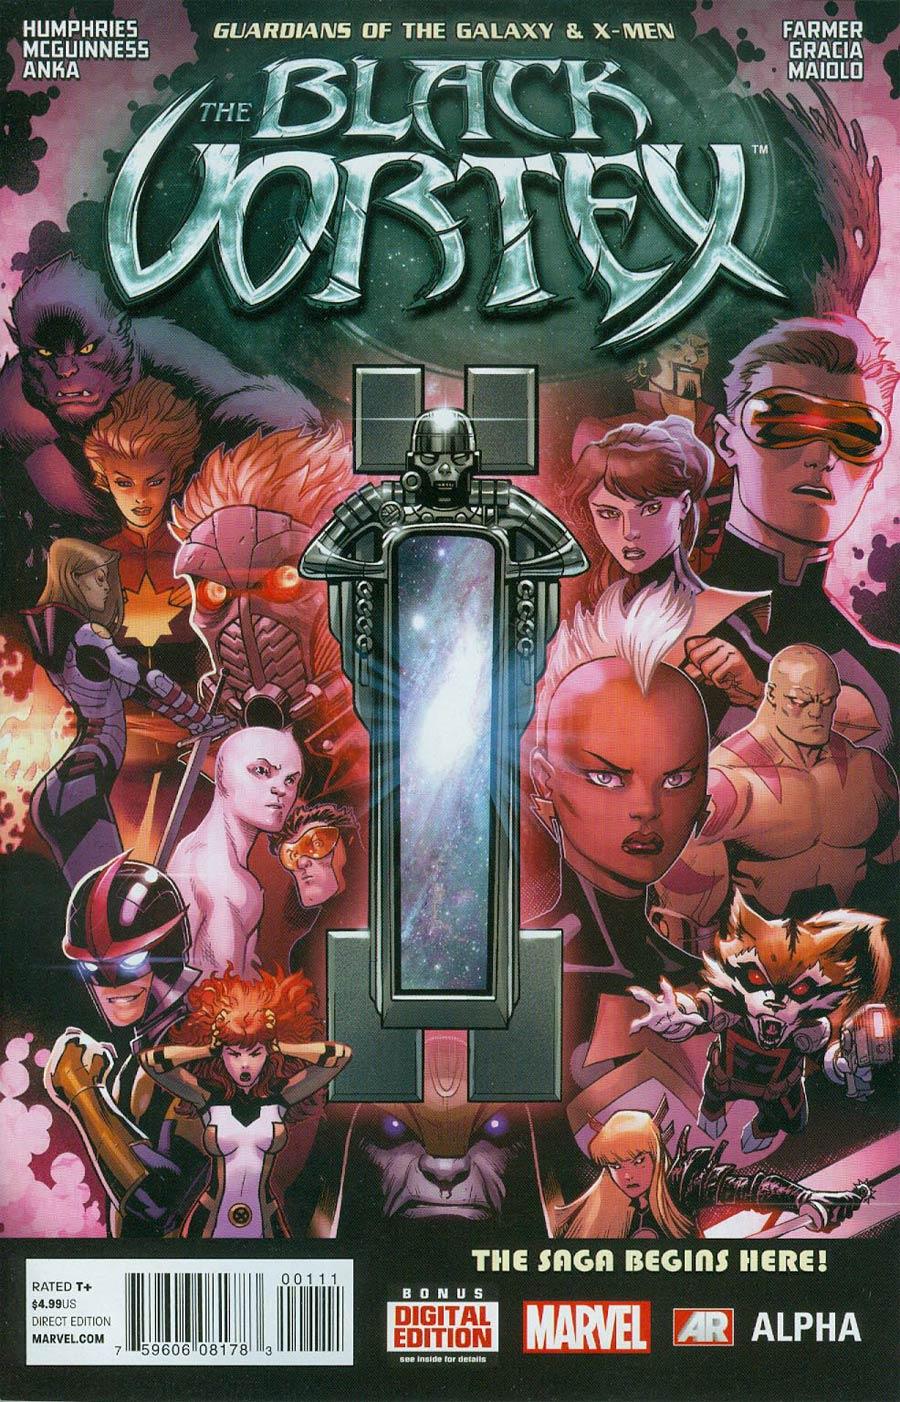 Guardians Of The Galaxy & X-Men Black Vortex Alpha #1 Cover A 1st Ptg Regular Ed McGuinness Cover (Black Vortex Part 1)